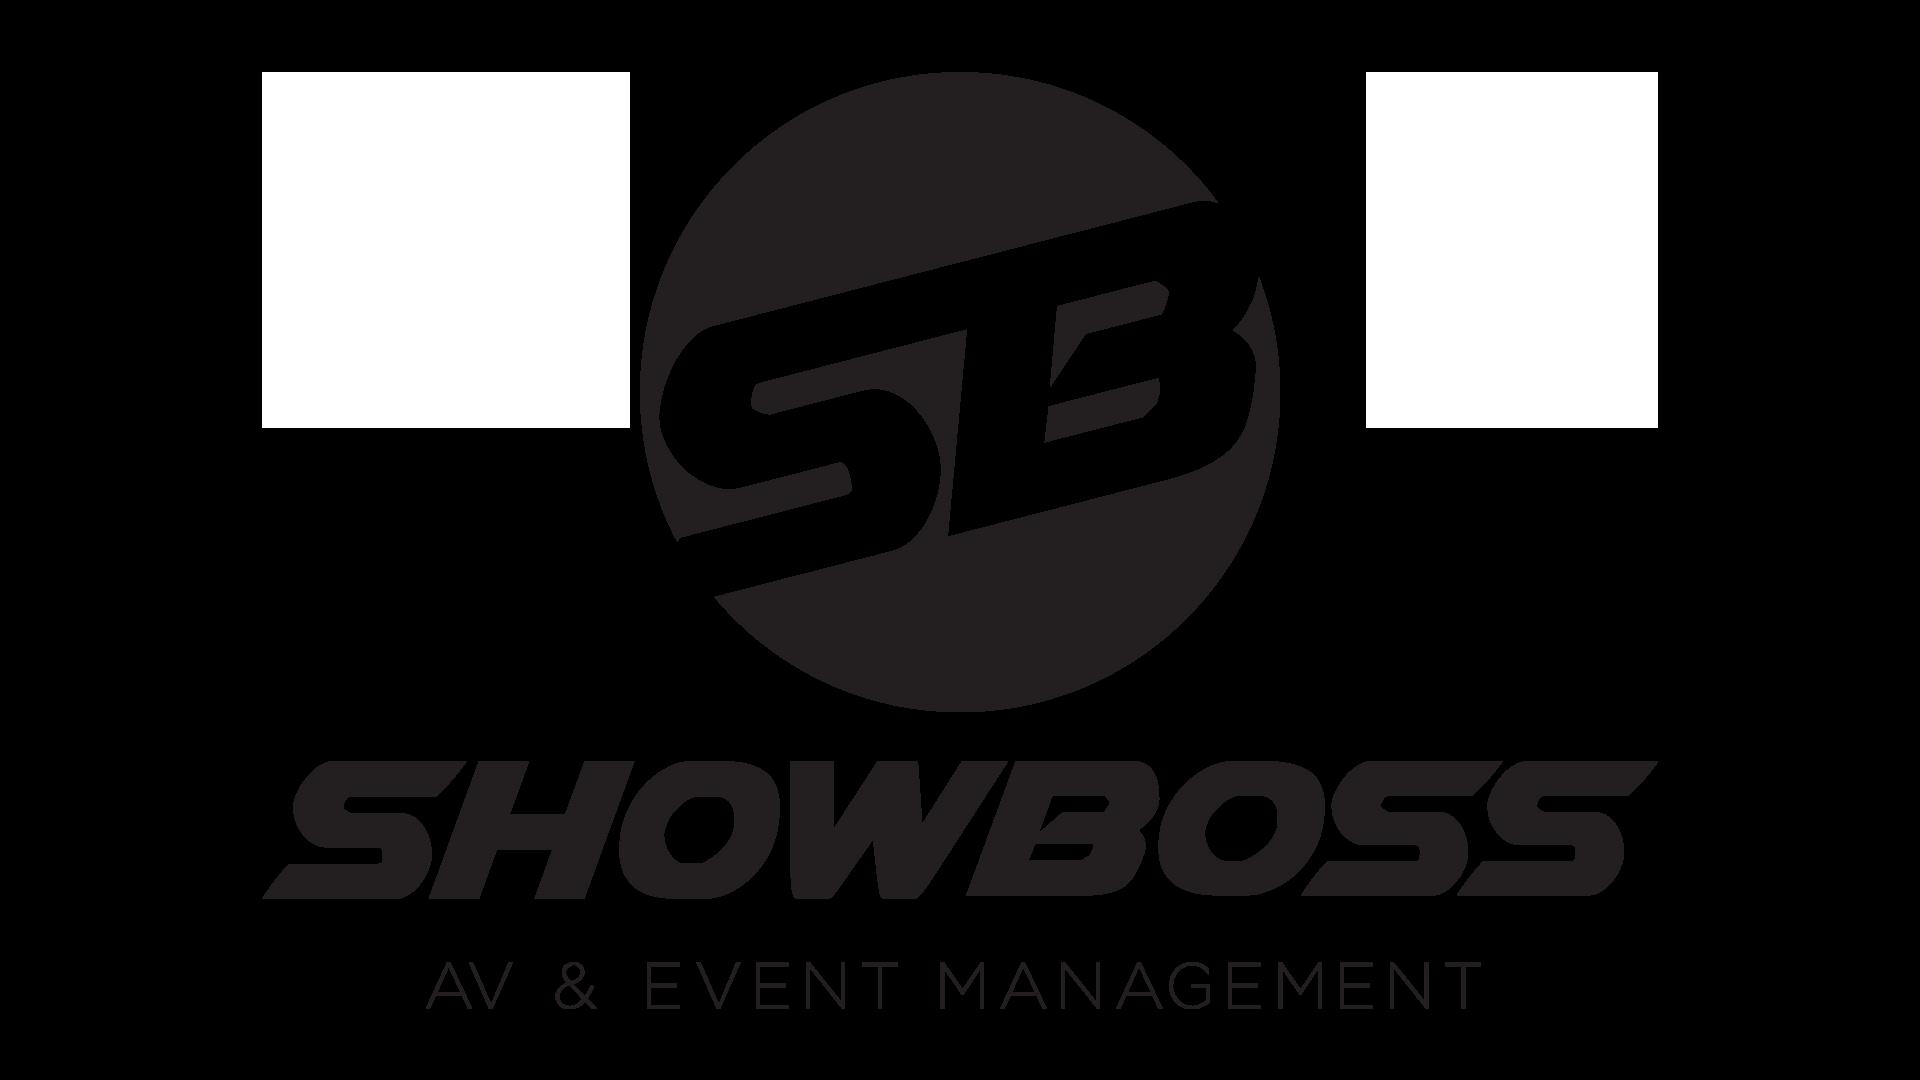 ShowbossLogo.png